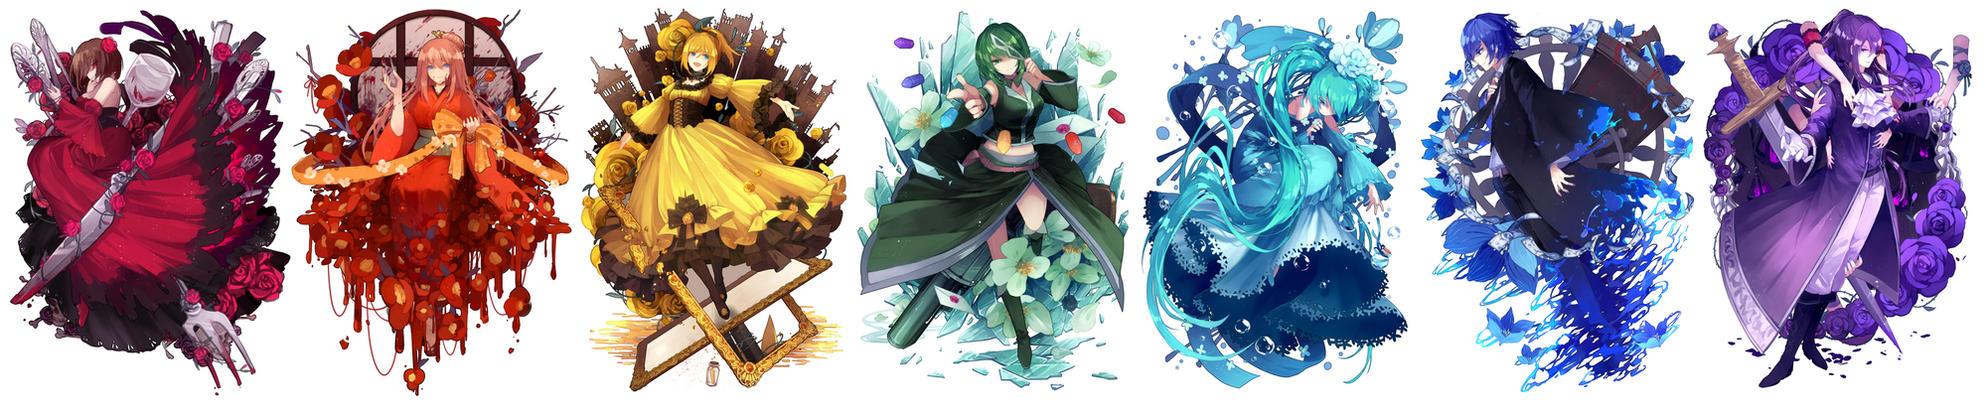 Evillious Chronicles Vocaloid by ArizQuel